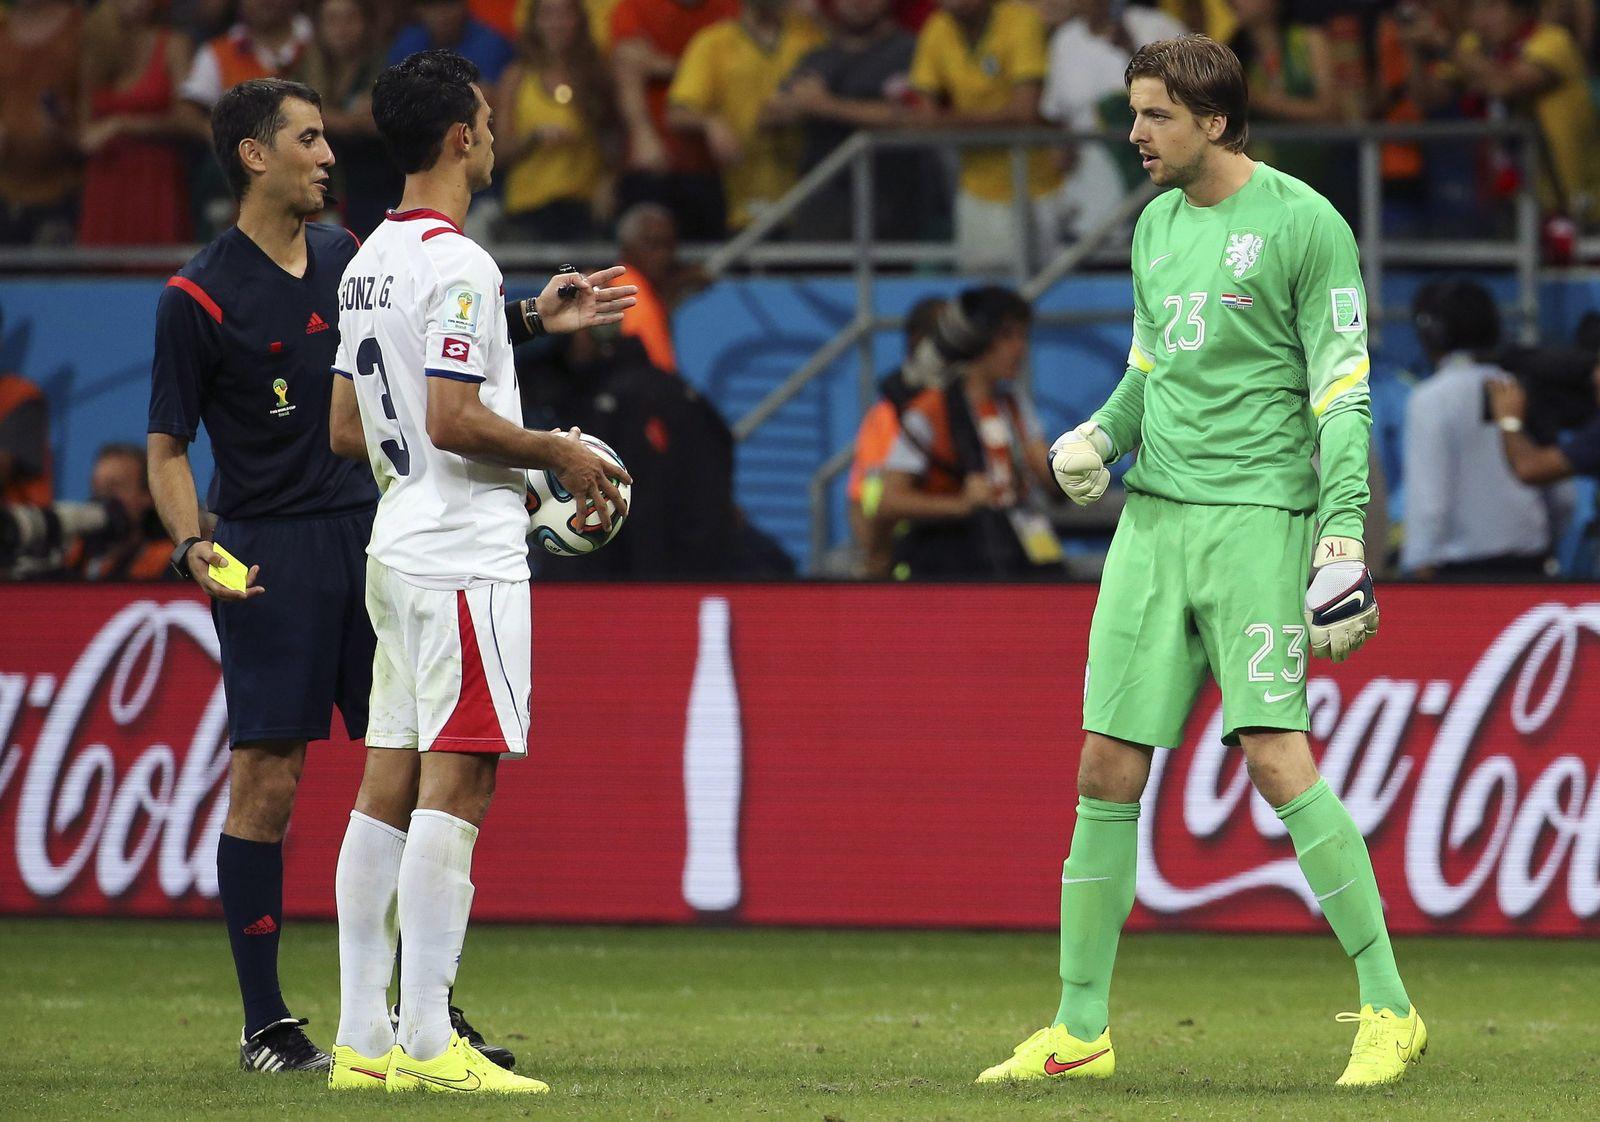 Tim Krul Niederlande Costa Rica